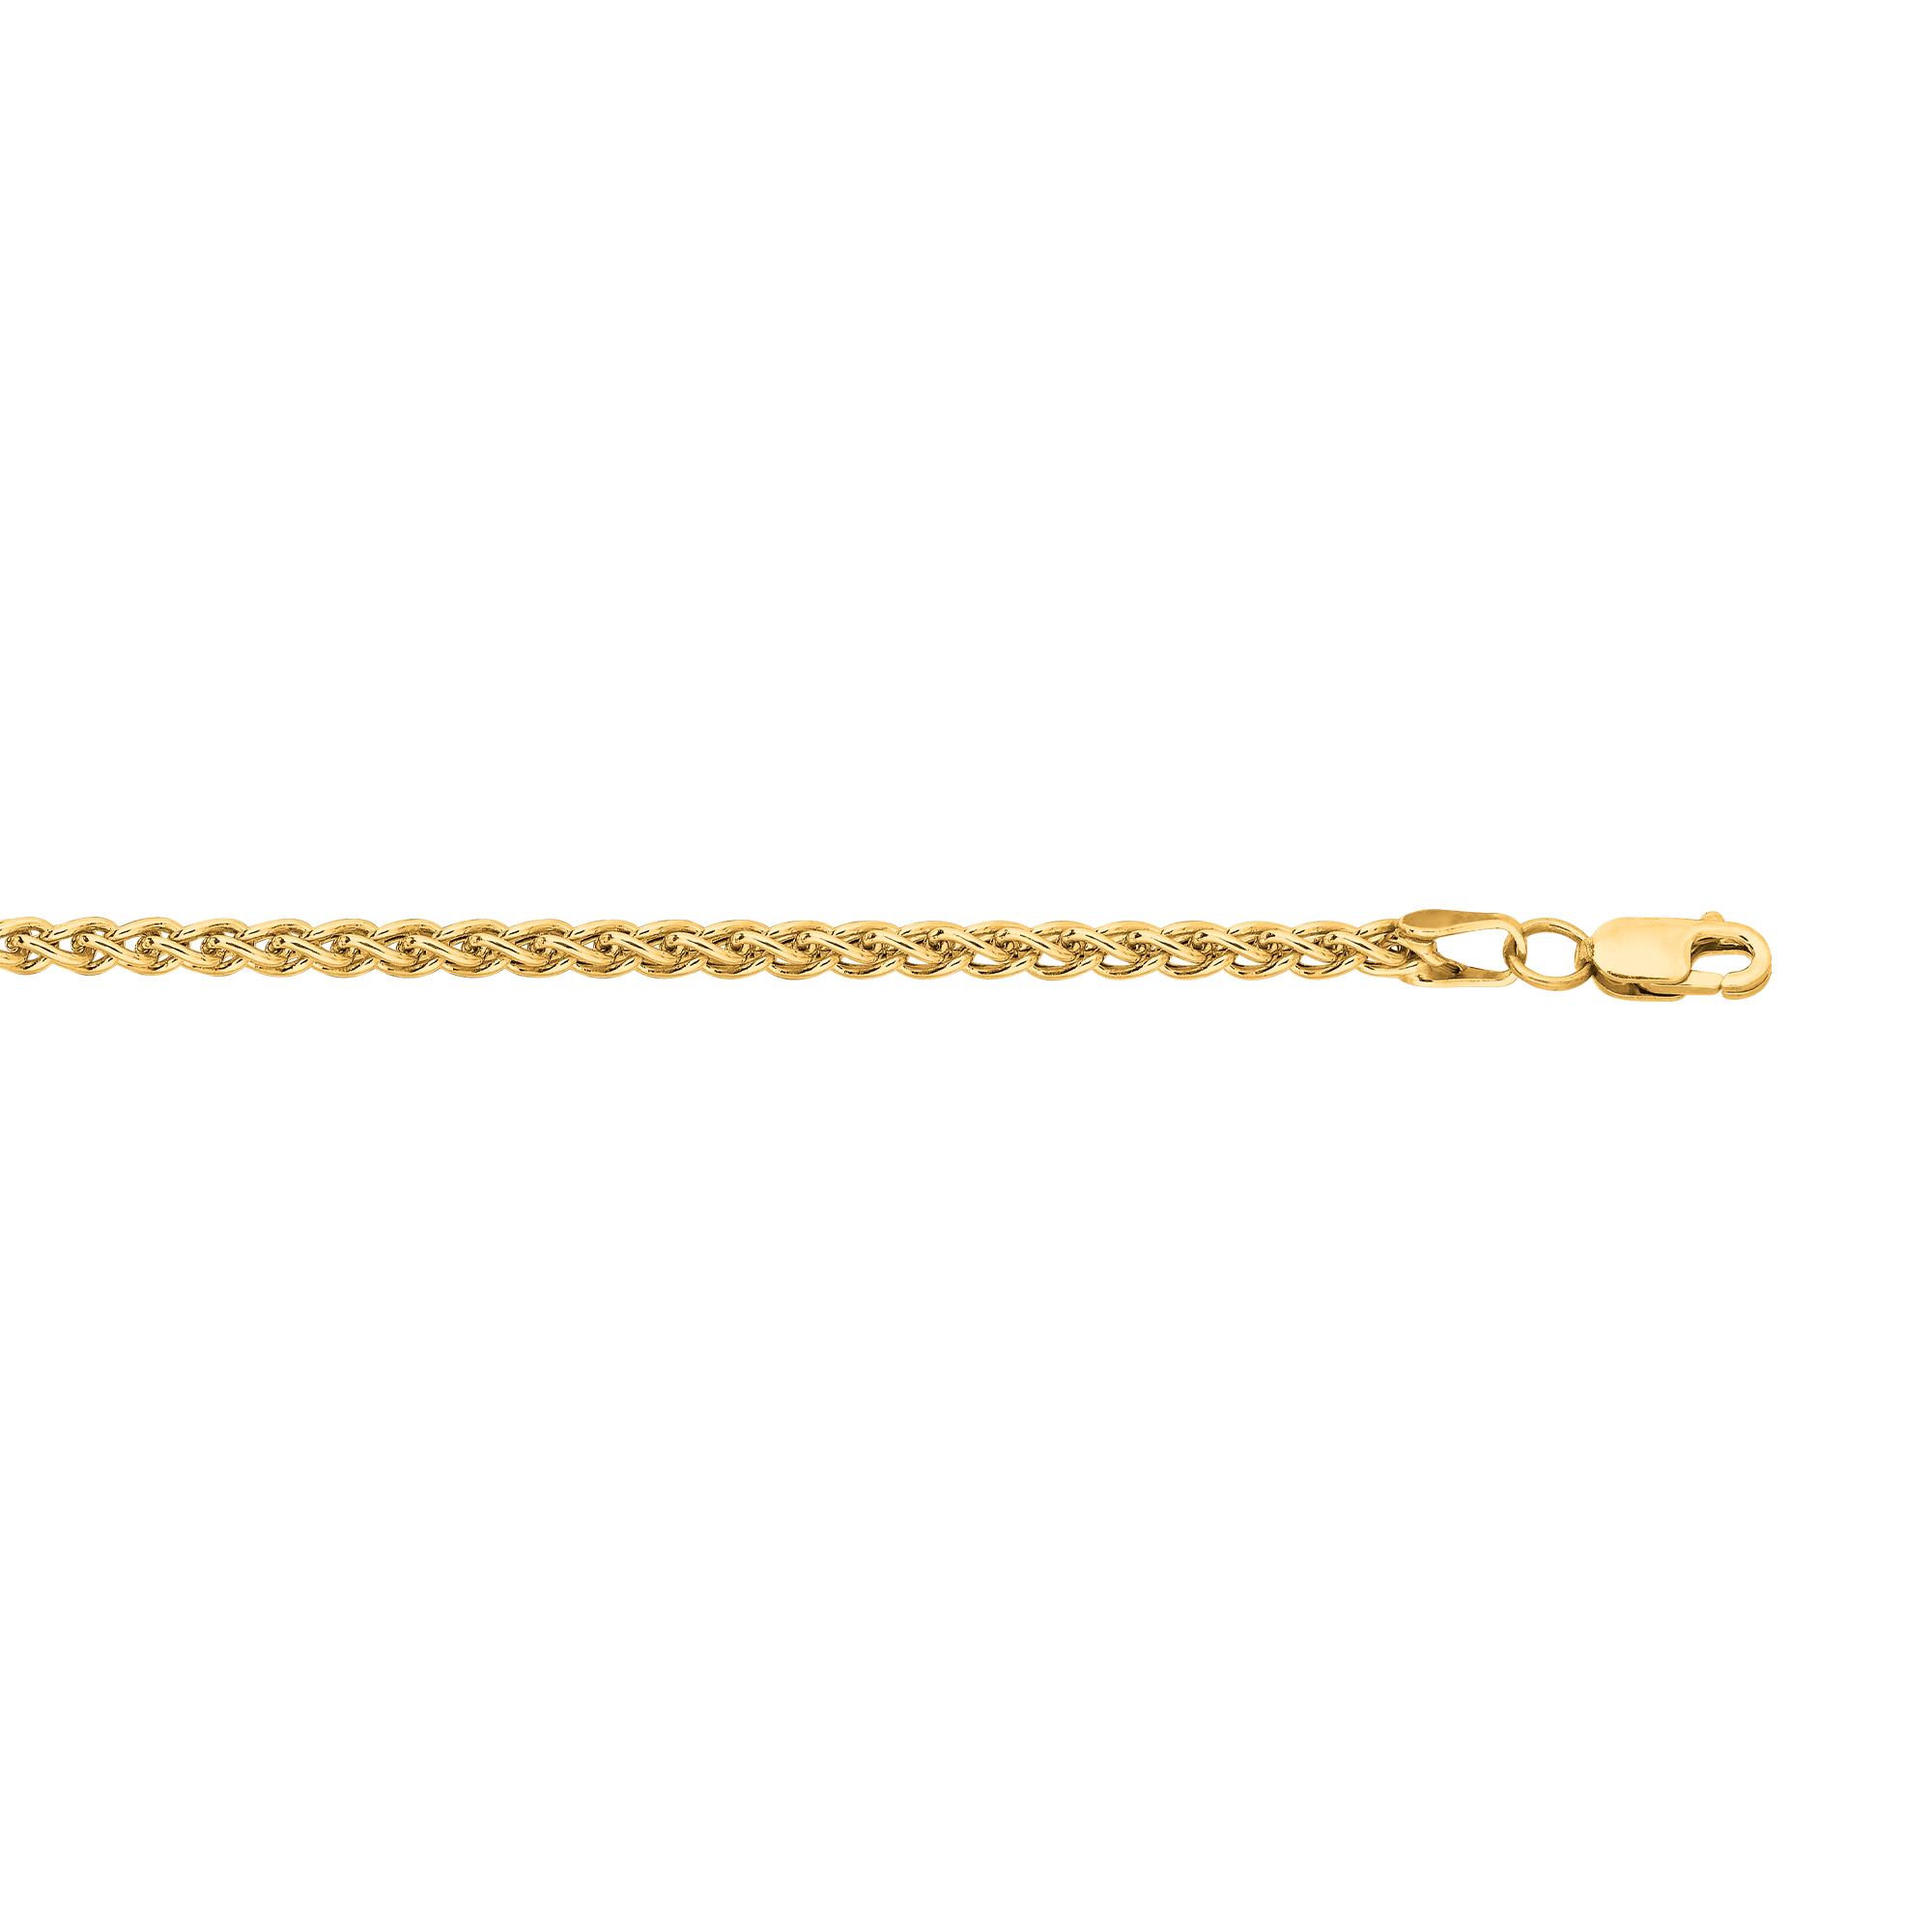 Hollow 14k Gold Wheat Chain For Men & Women 2.8mm Wide